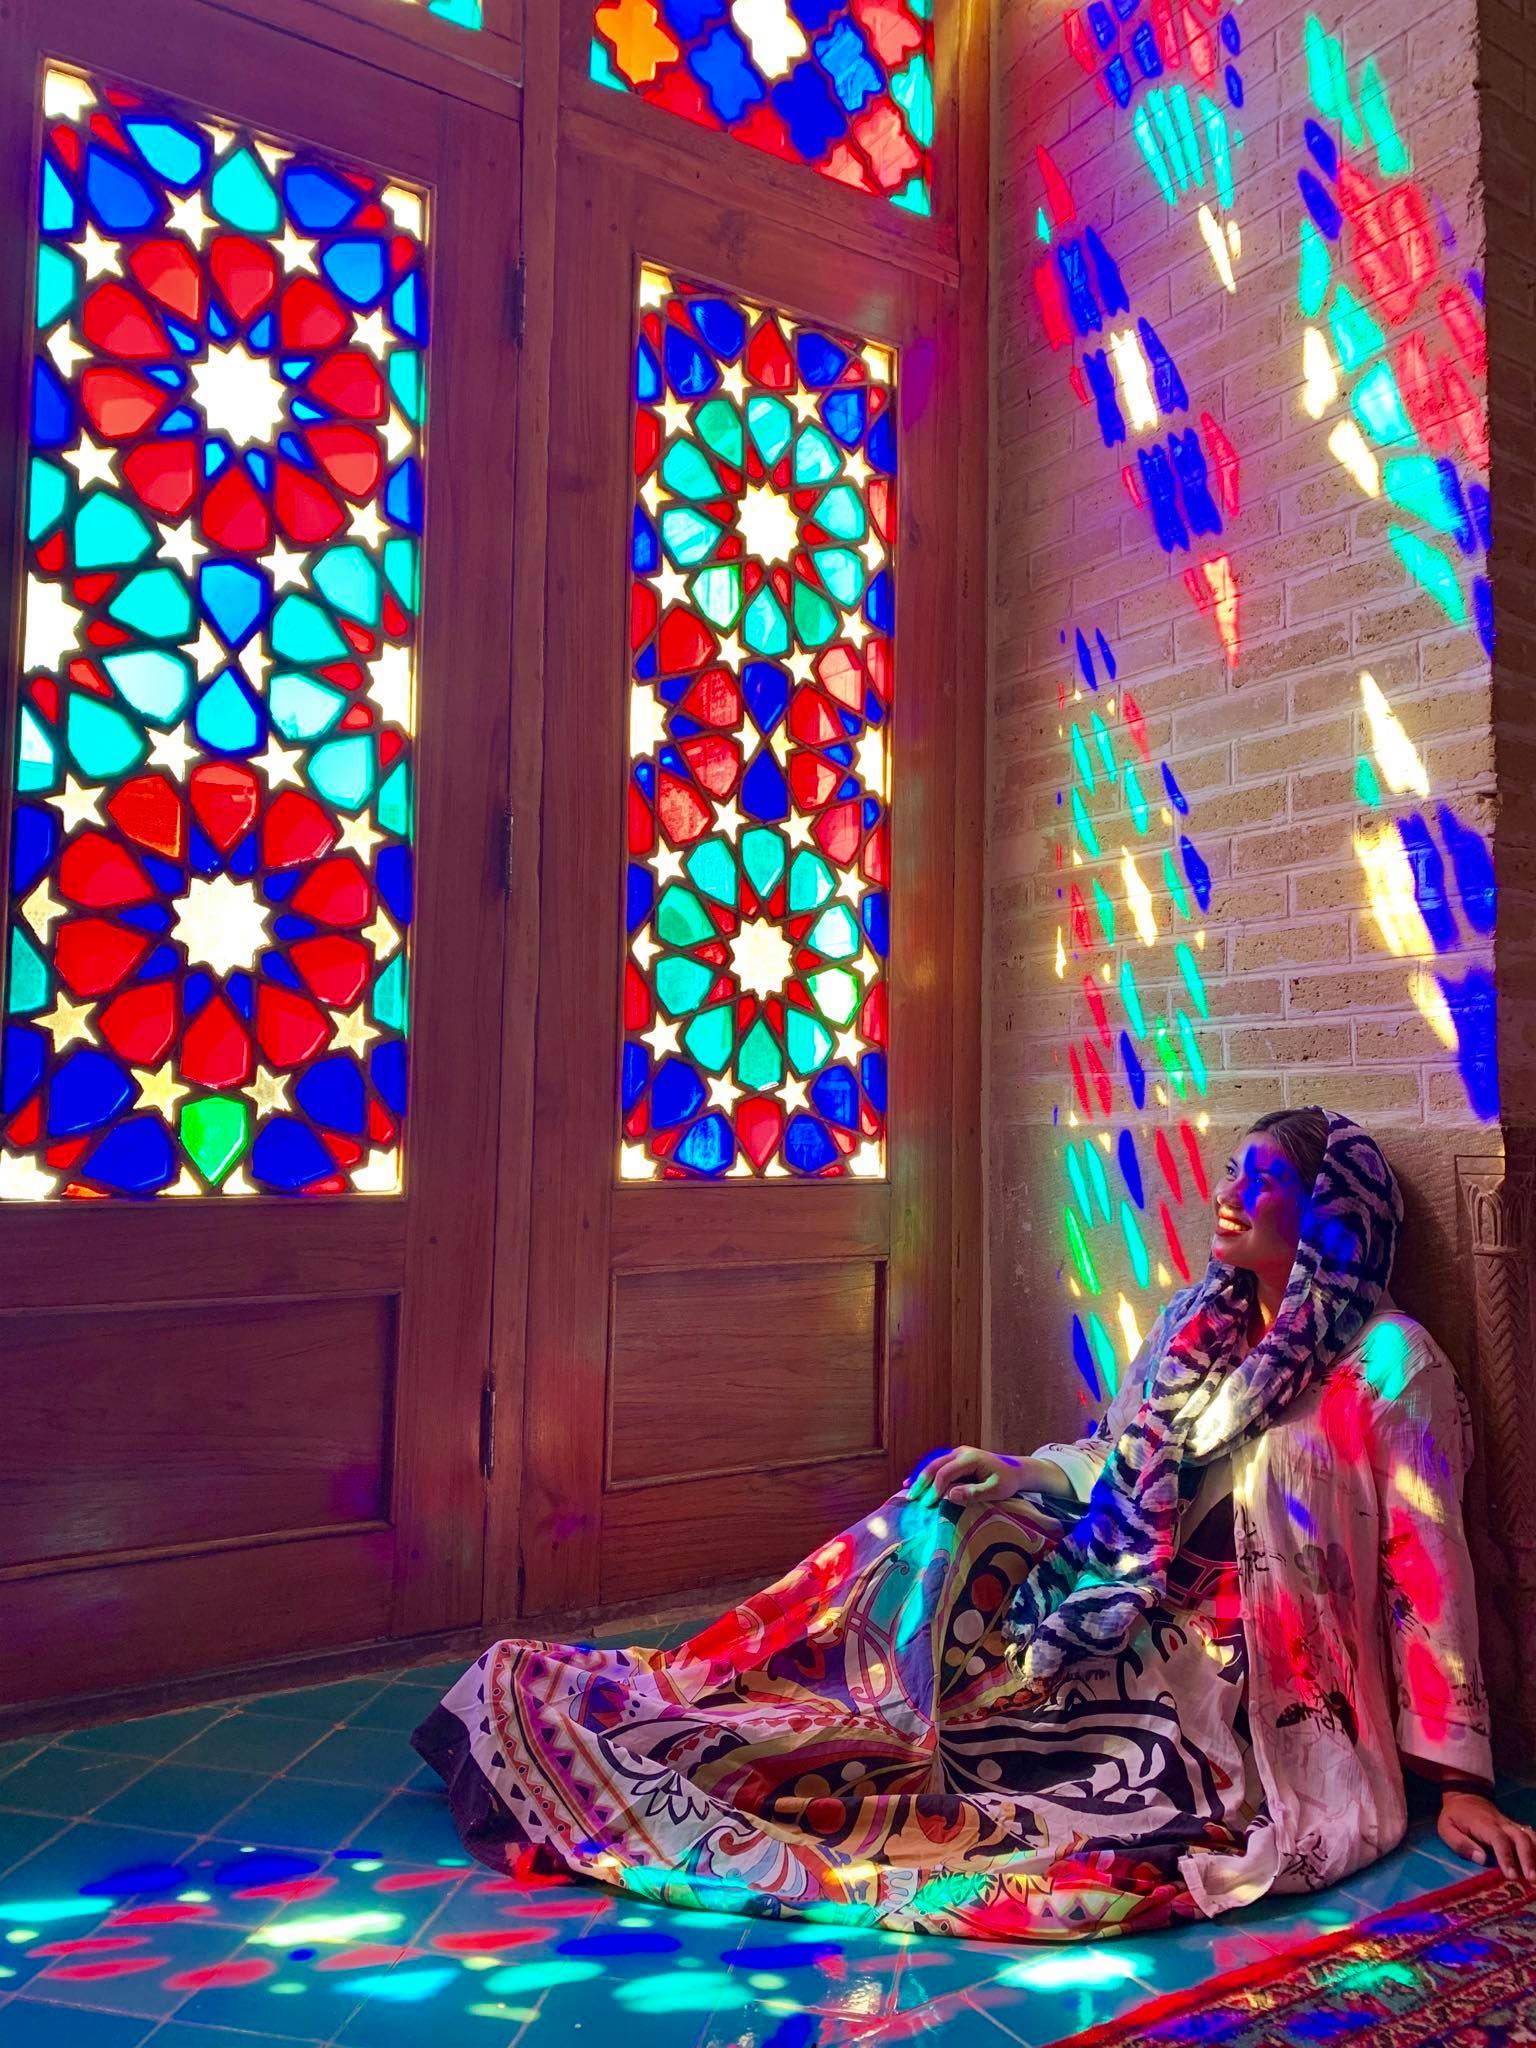 Kach Solo Travels in 2019 Good morning from SHIRAZ, IRAN5.jpg